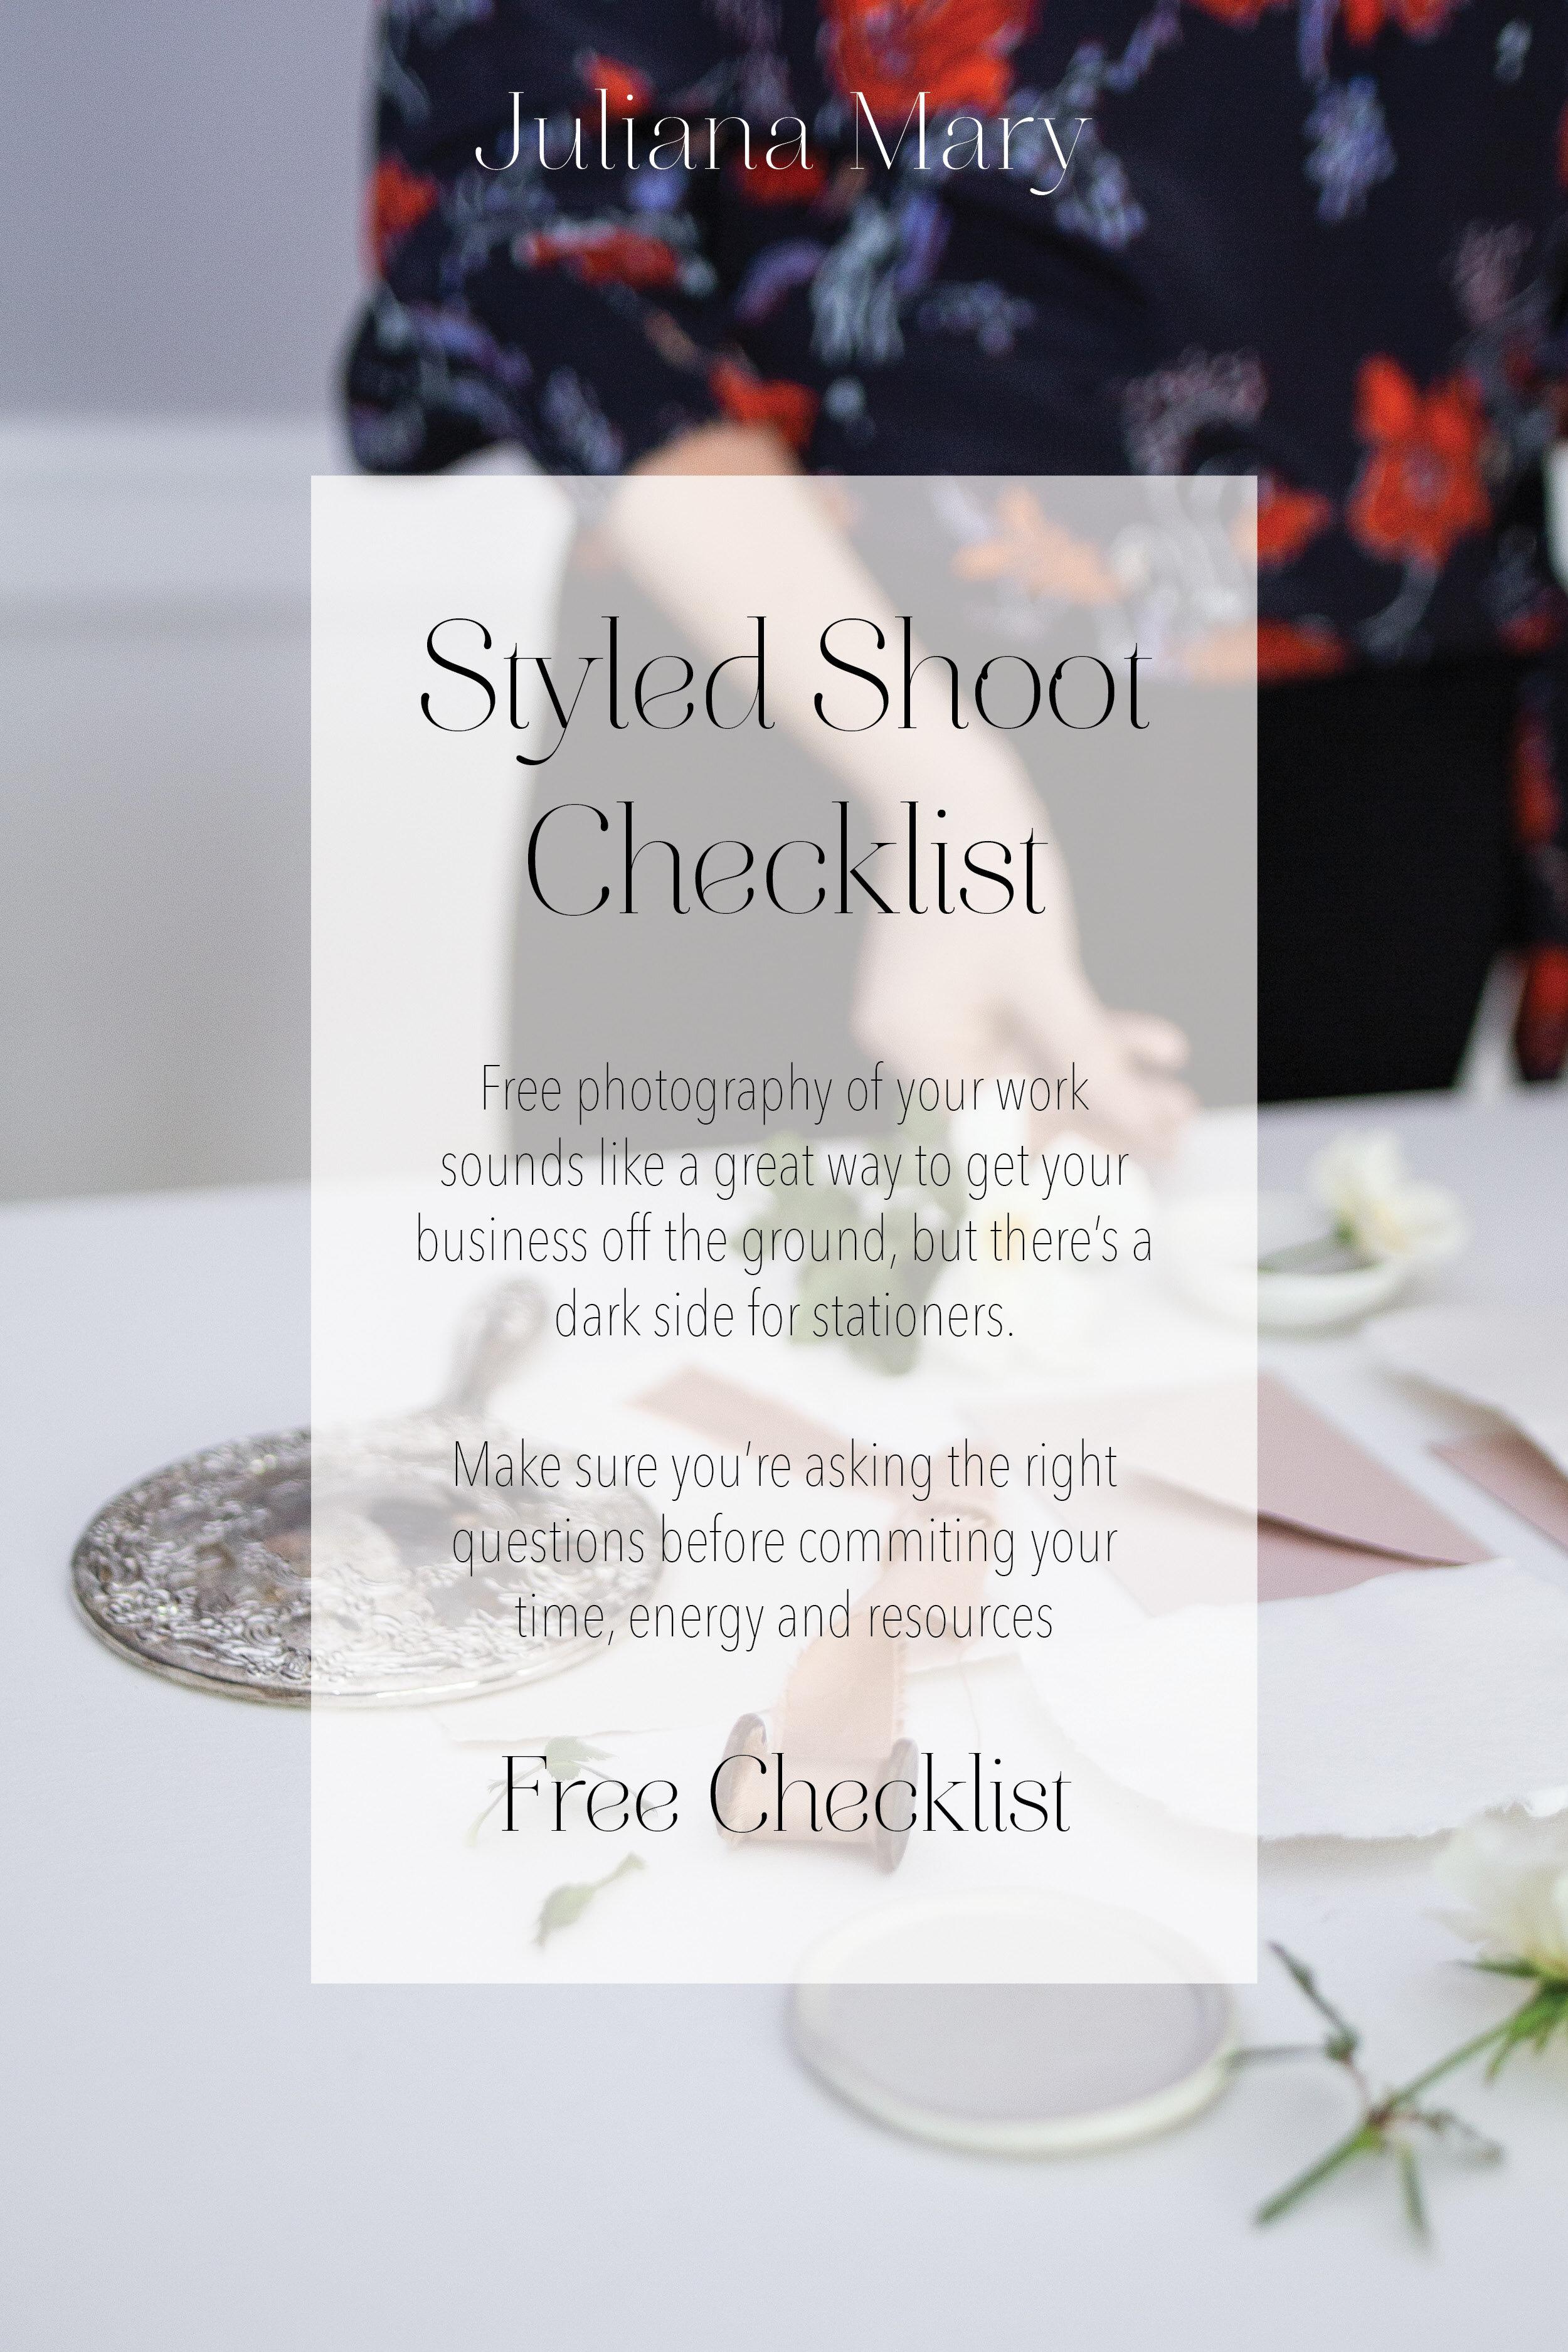 Styled Shoot Checklist.jpg